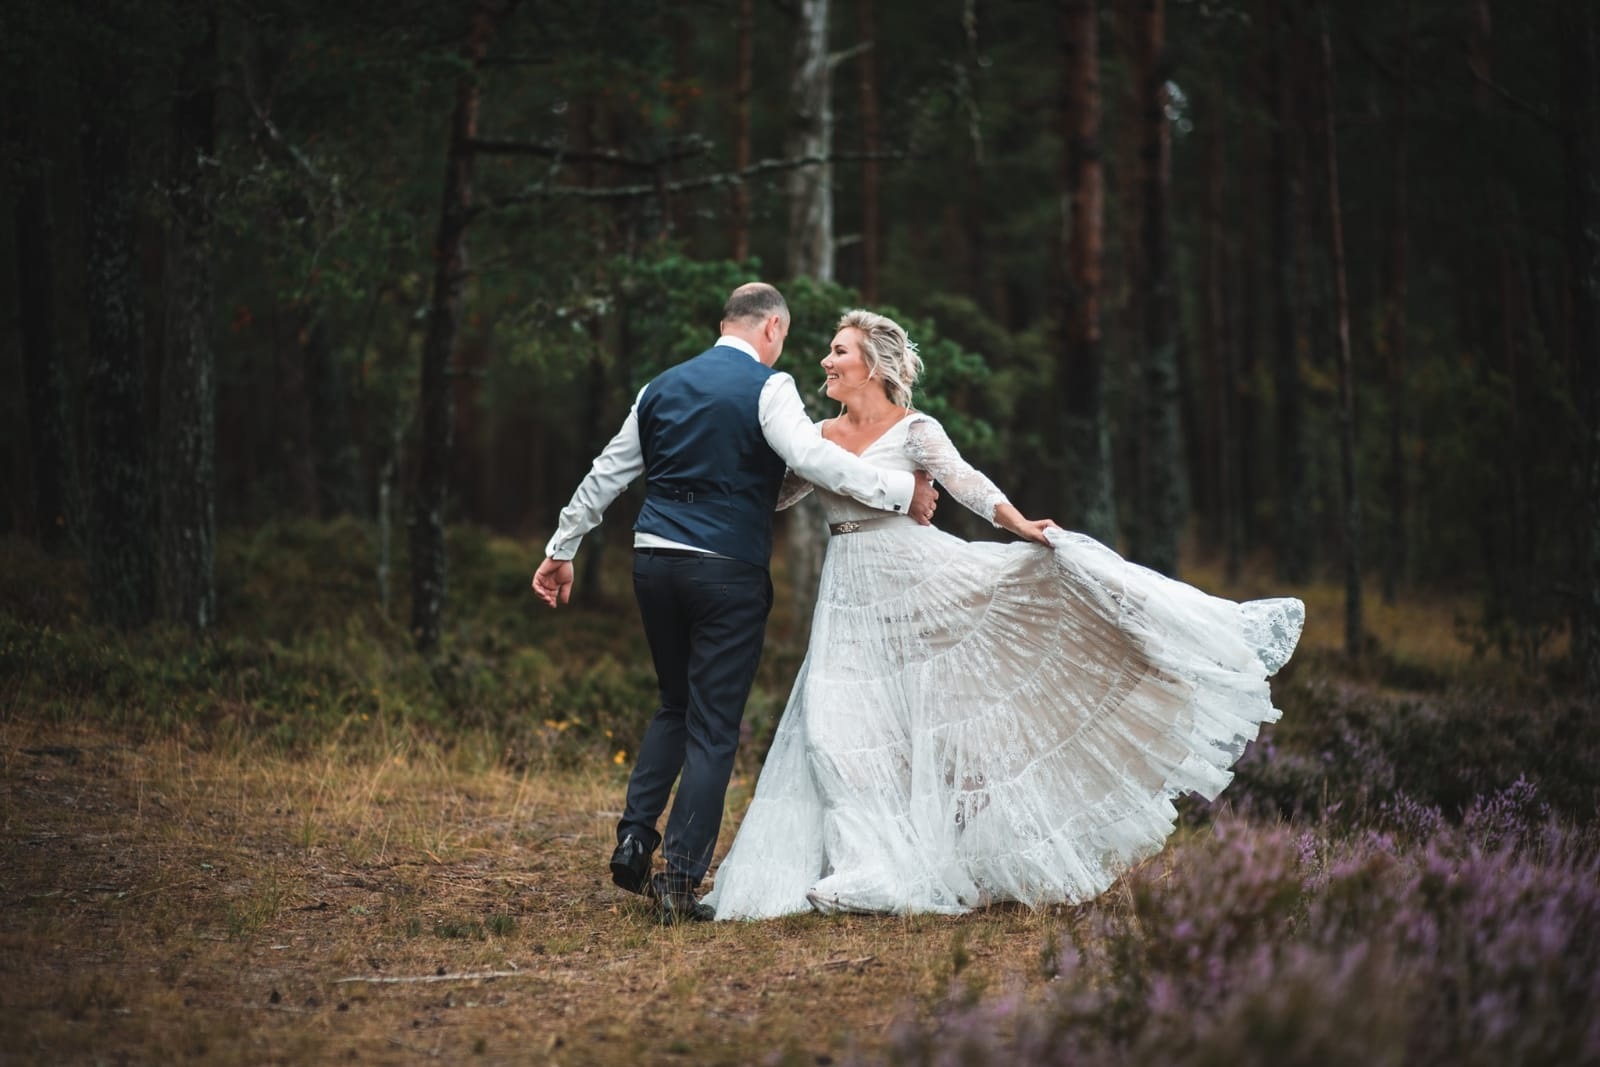 amelia-wedding-dresses-bride-070